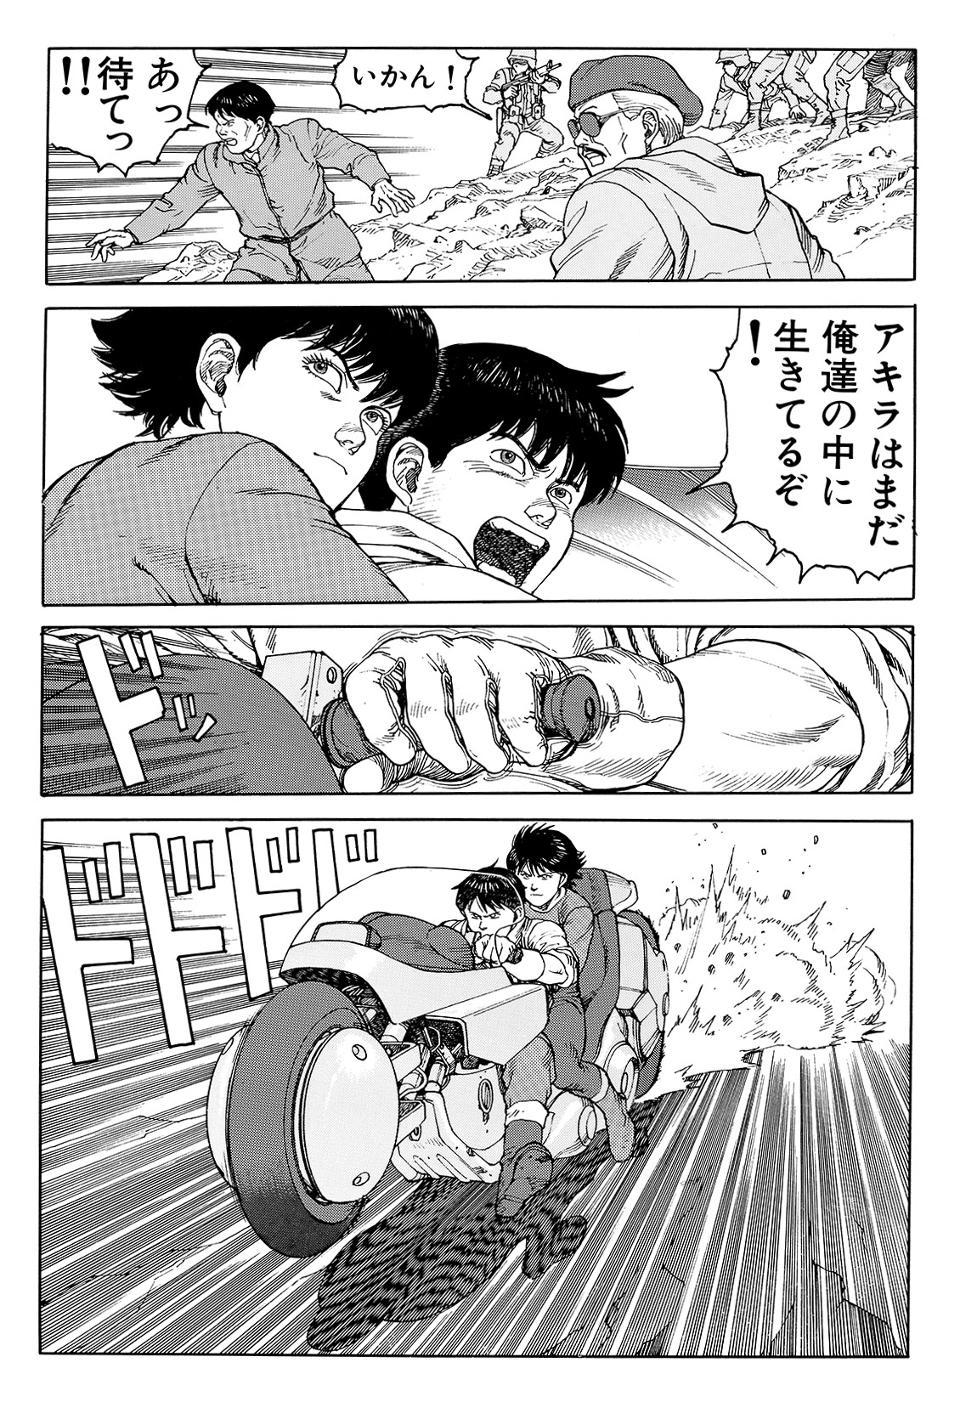 otomo_interview_akira_manga.jpg